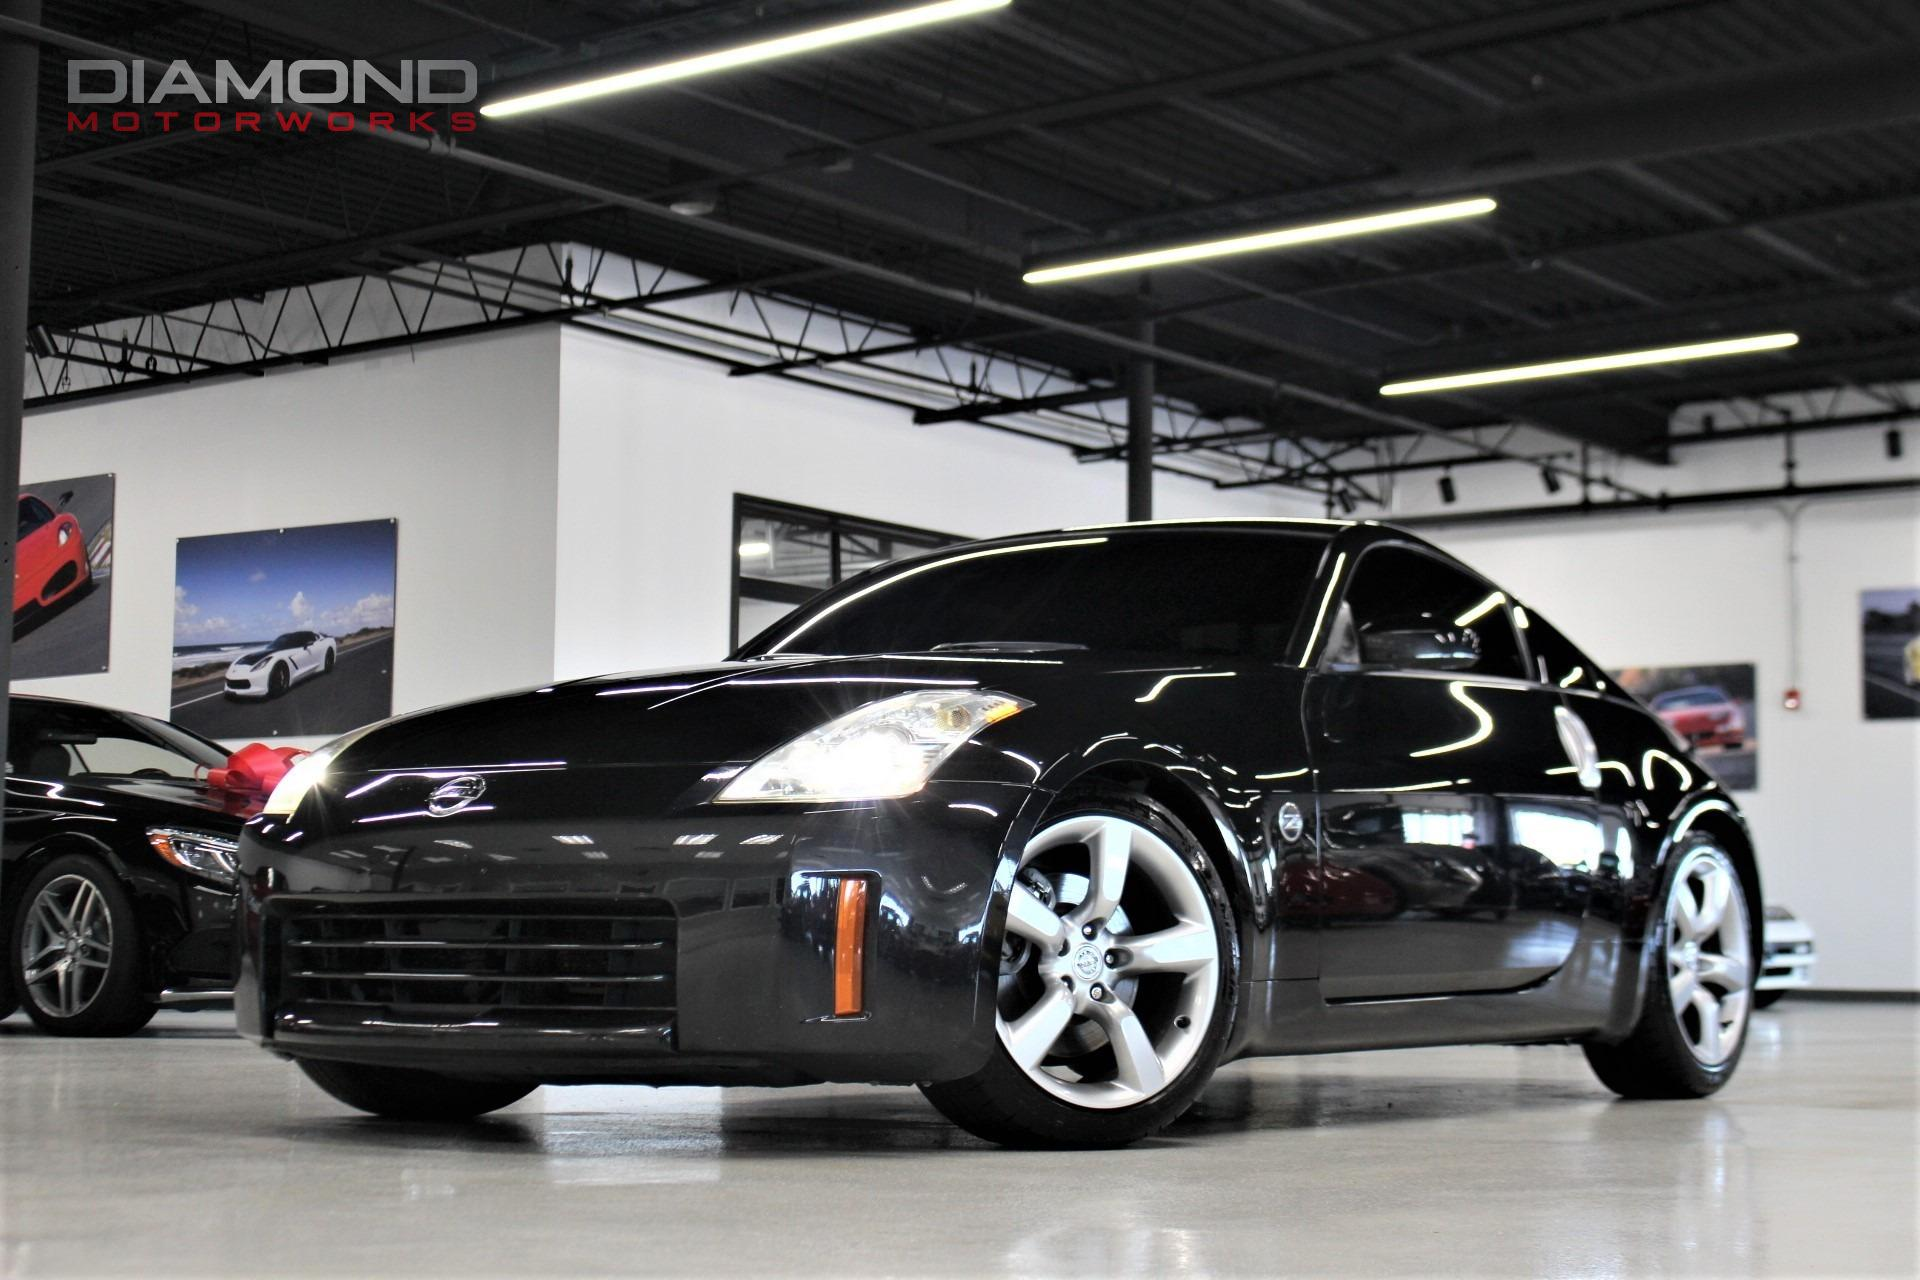 350z For Sale Near Me >> 2006 Nissan 350Z Enthusiast Stock # 312298 for sale near